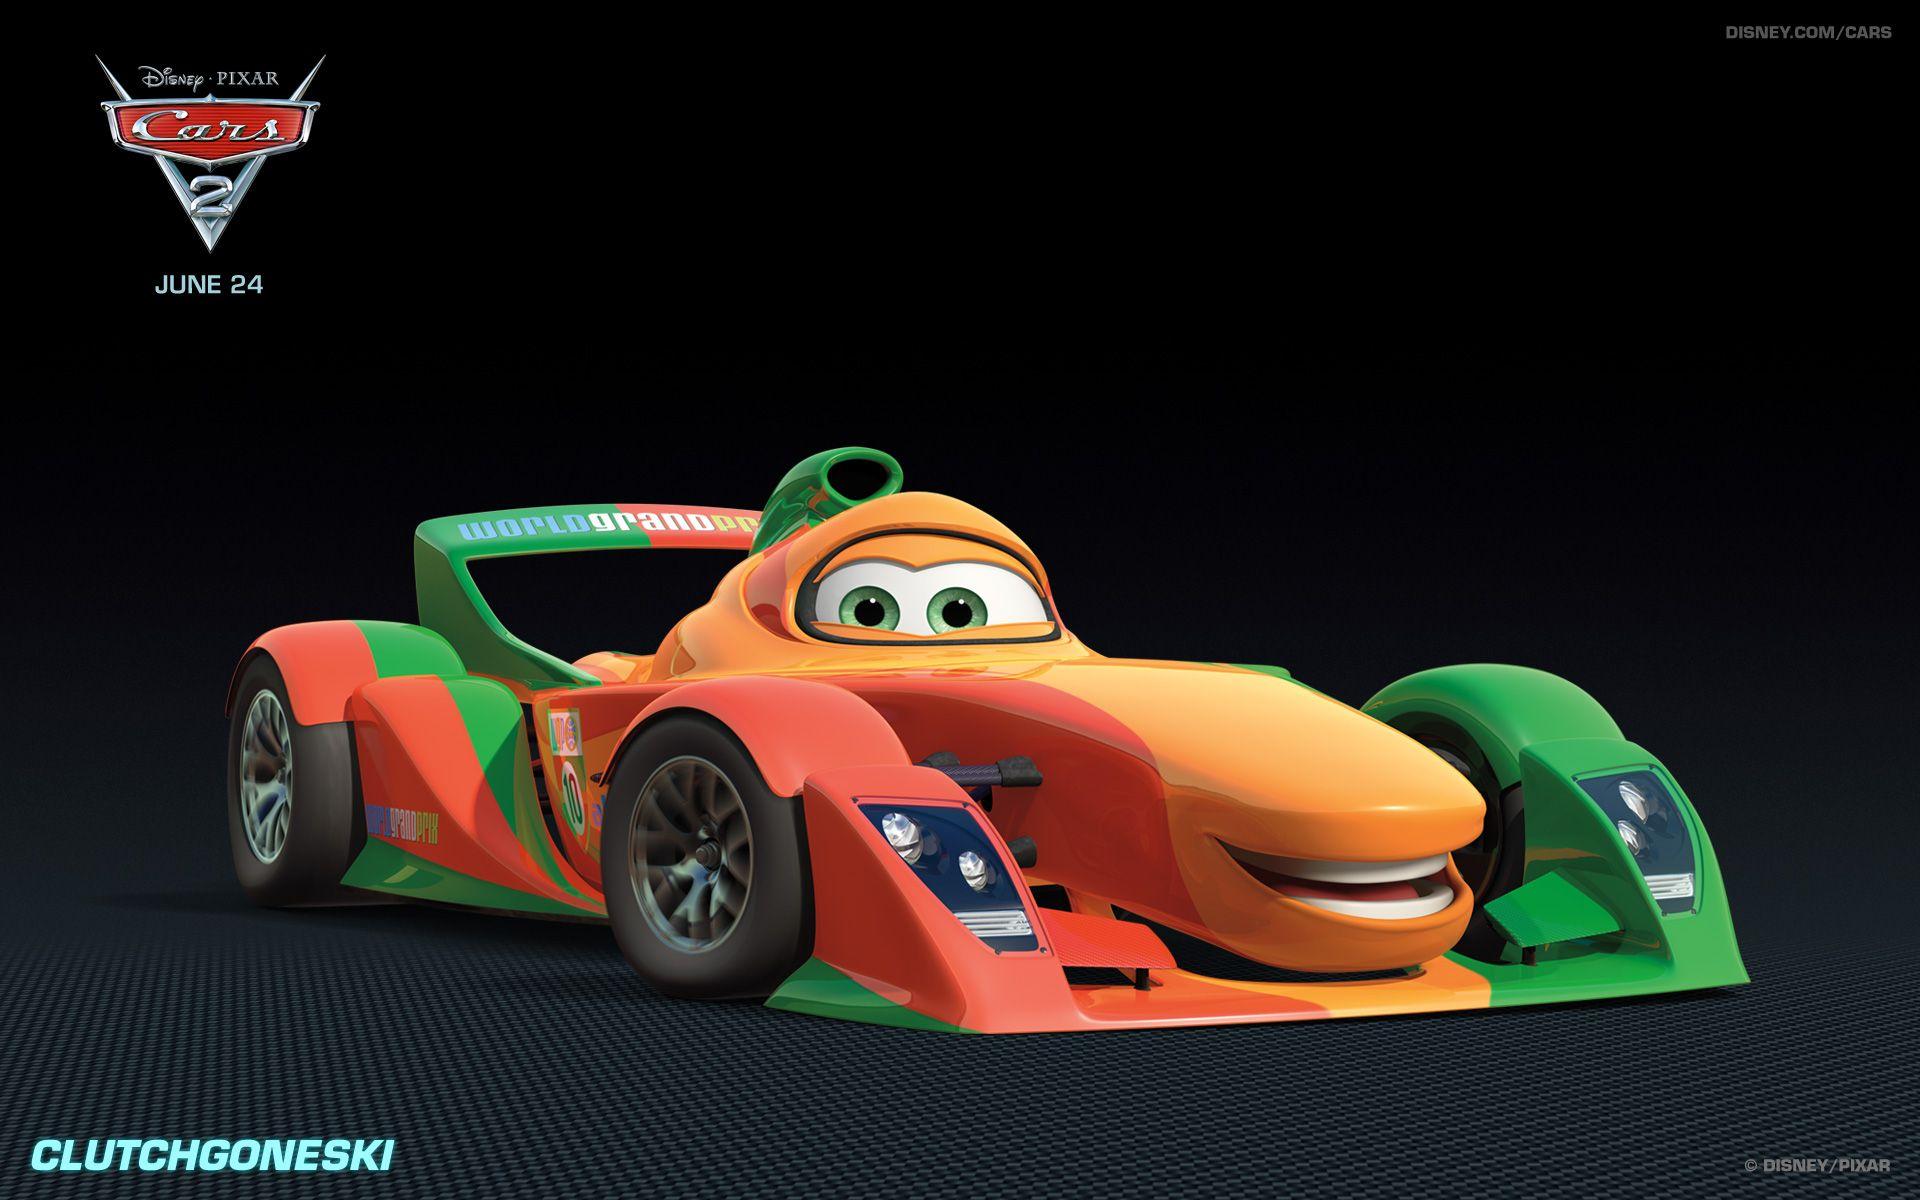 Clutchgoneski Personajes Cars Disney Cars Pixar